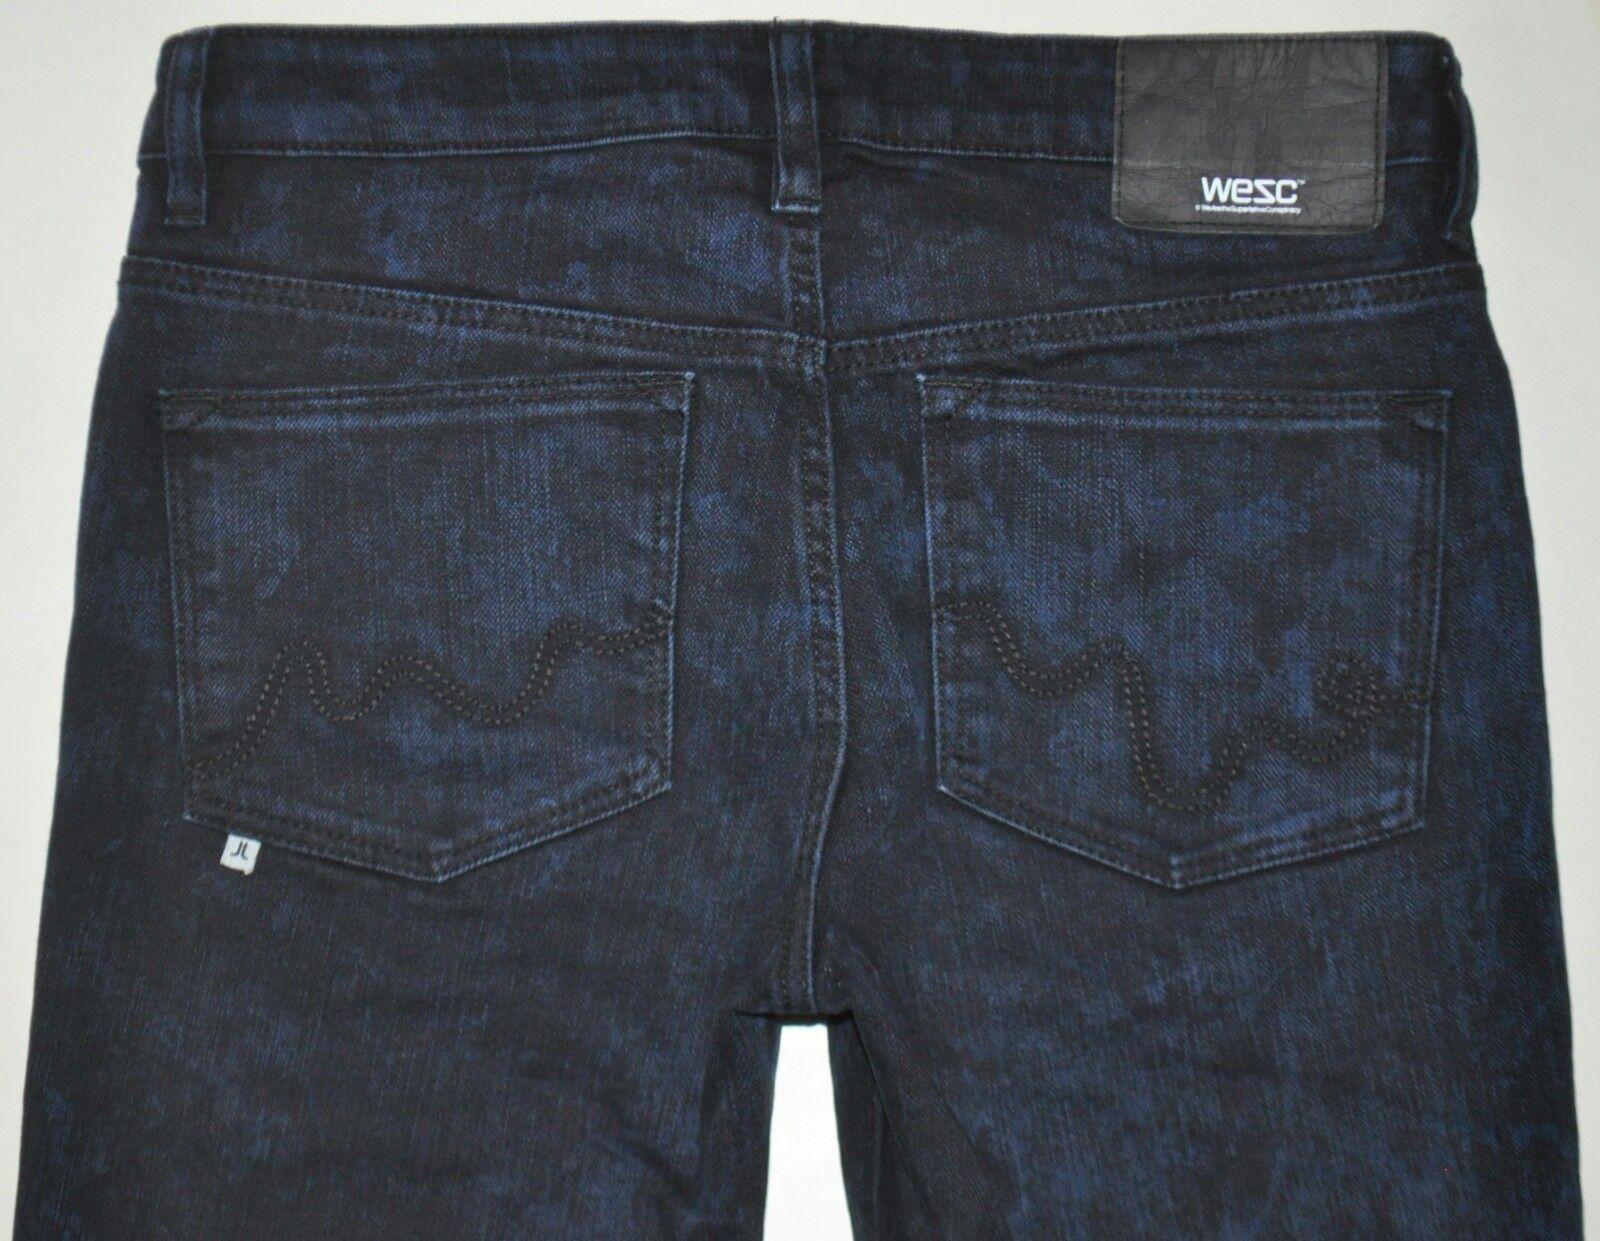 WESC Women's Lizzy 46E Dark bluee Riot Skinny Leg Jeans Sz 28 X 29 PHENOMENAL EUC